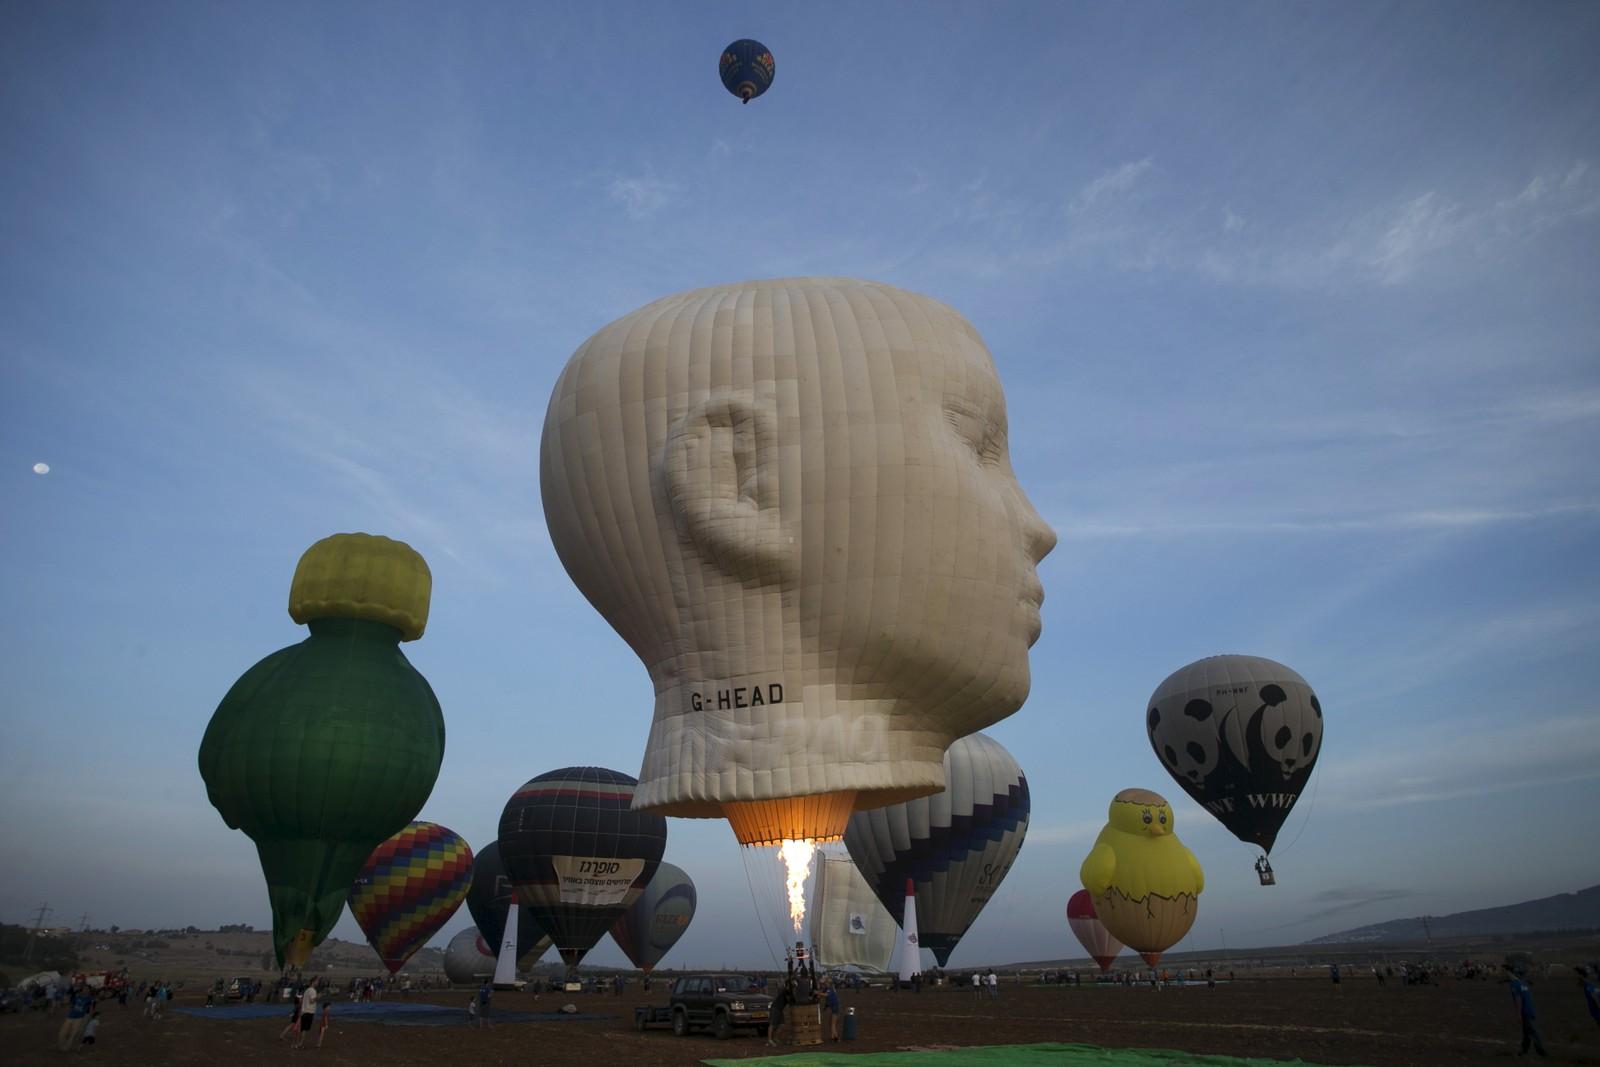 En luftballong-festival ble arrangert i Maayan Harod National park i Israel.